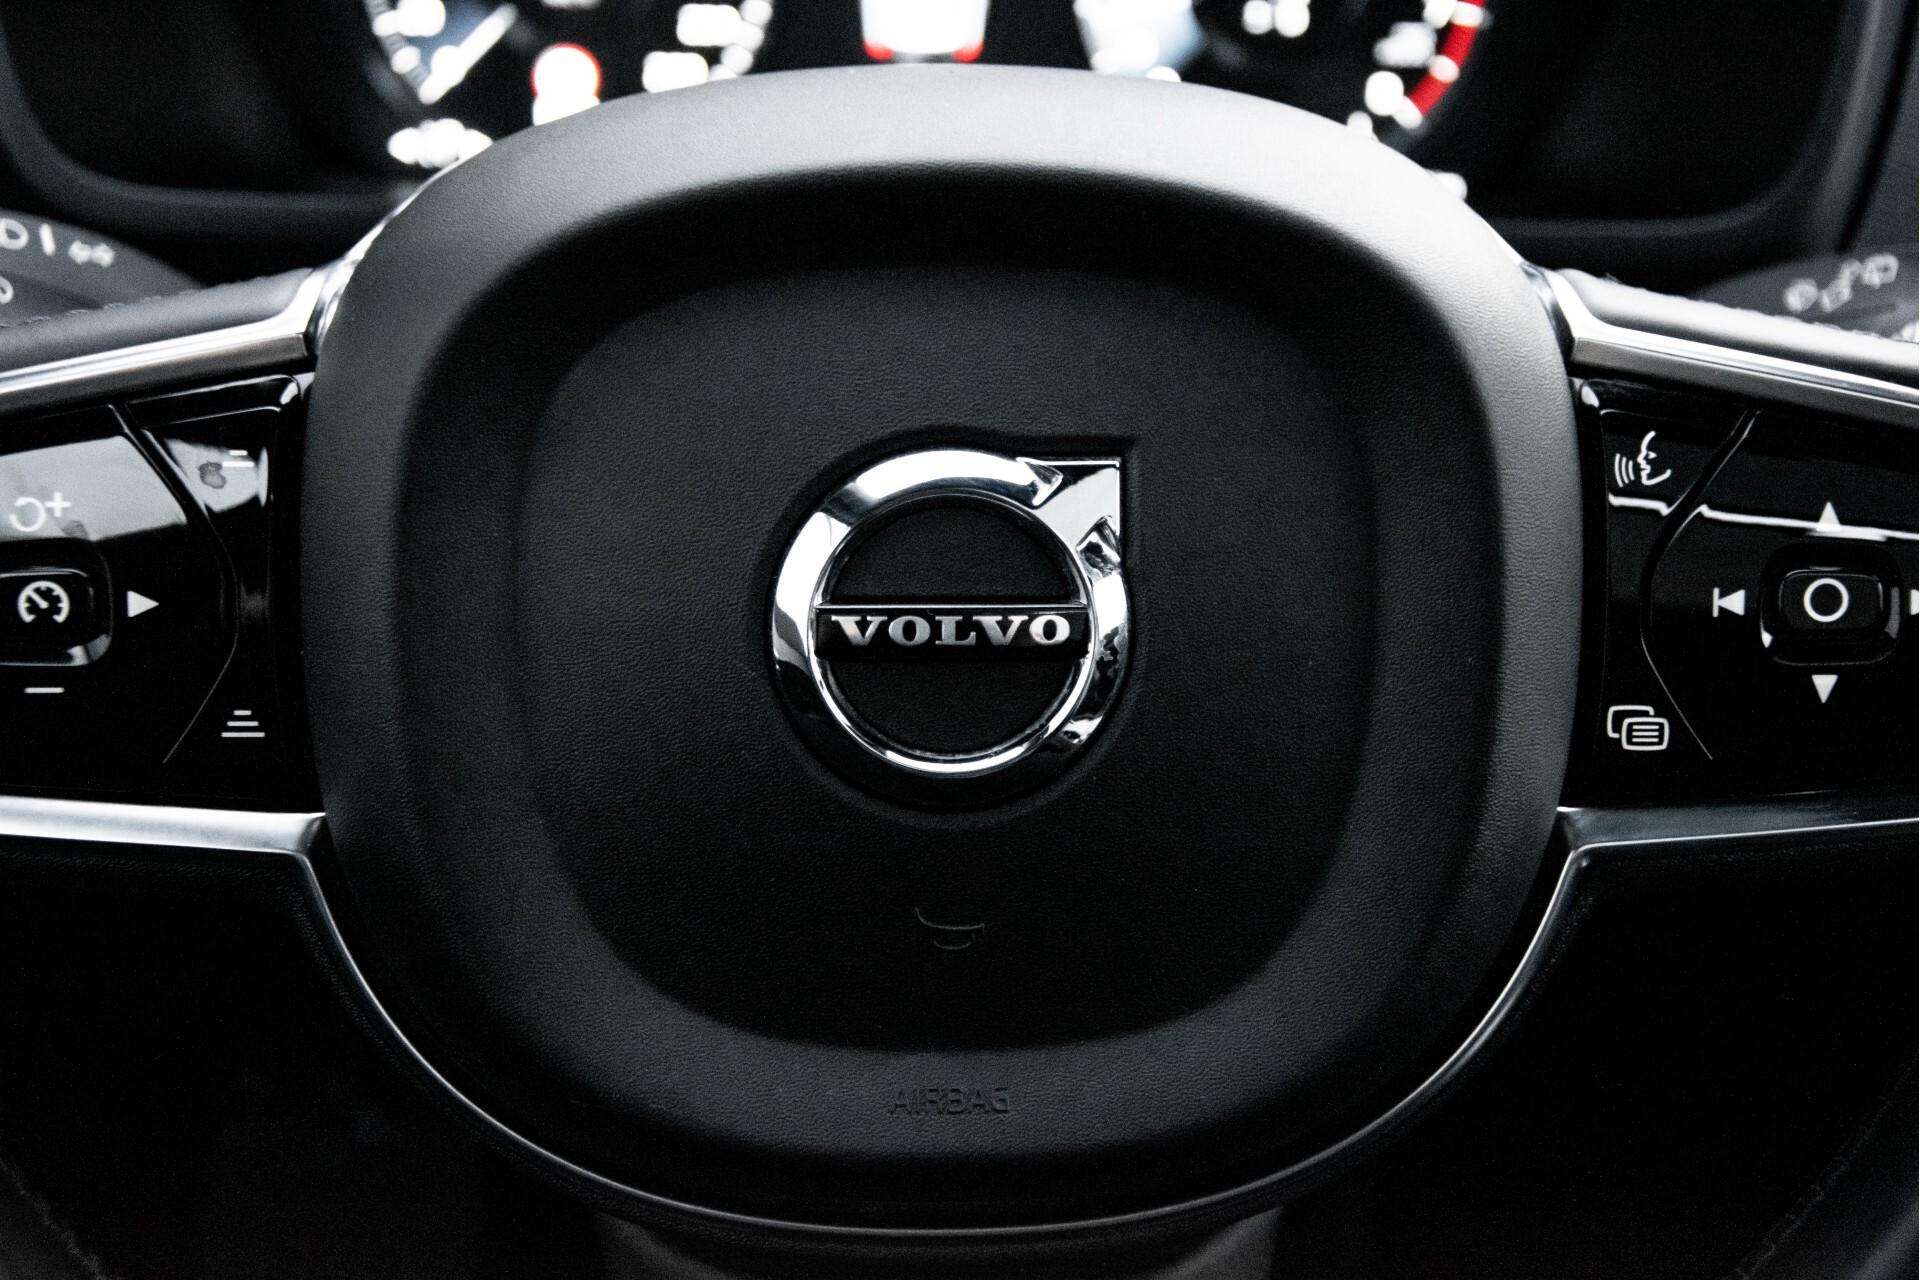 "Volvo XC90 2.0 T6 AWD R-Design Panorama/Keyless/B&W/ACC/Standkachel/22"" Aut8 Foto 15"